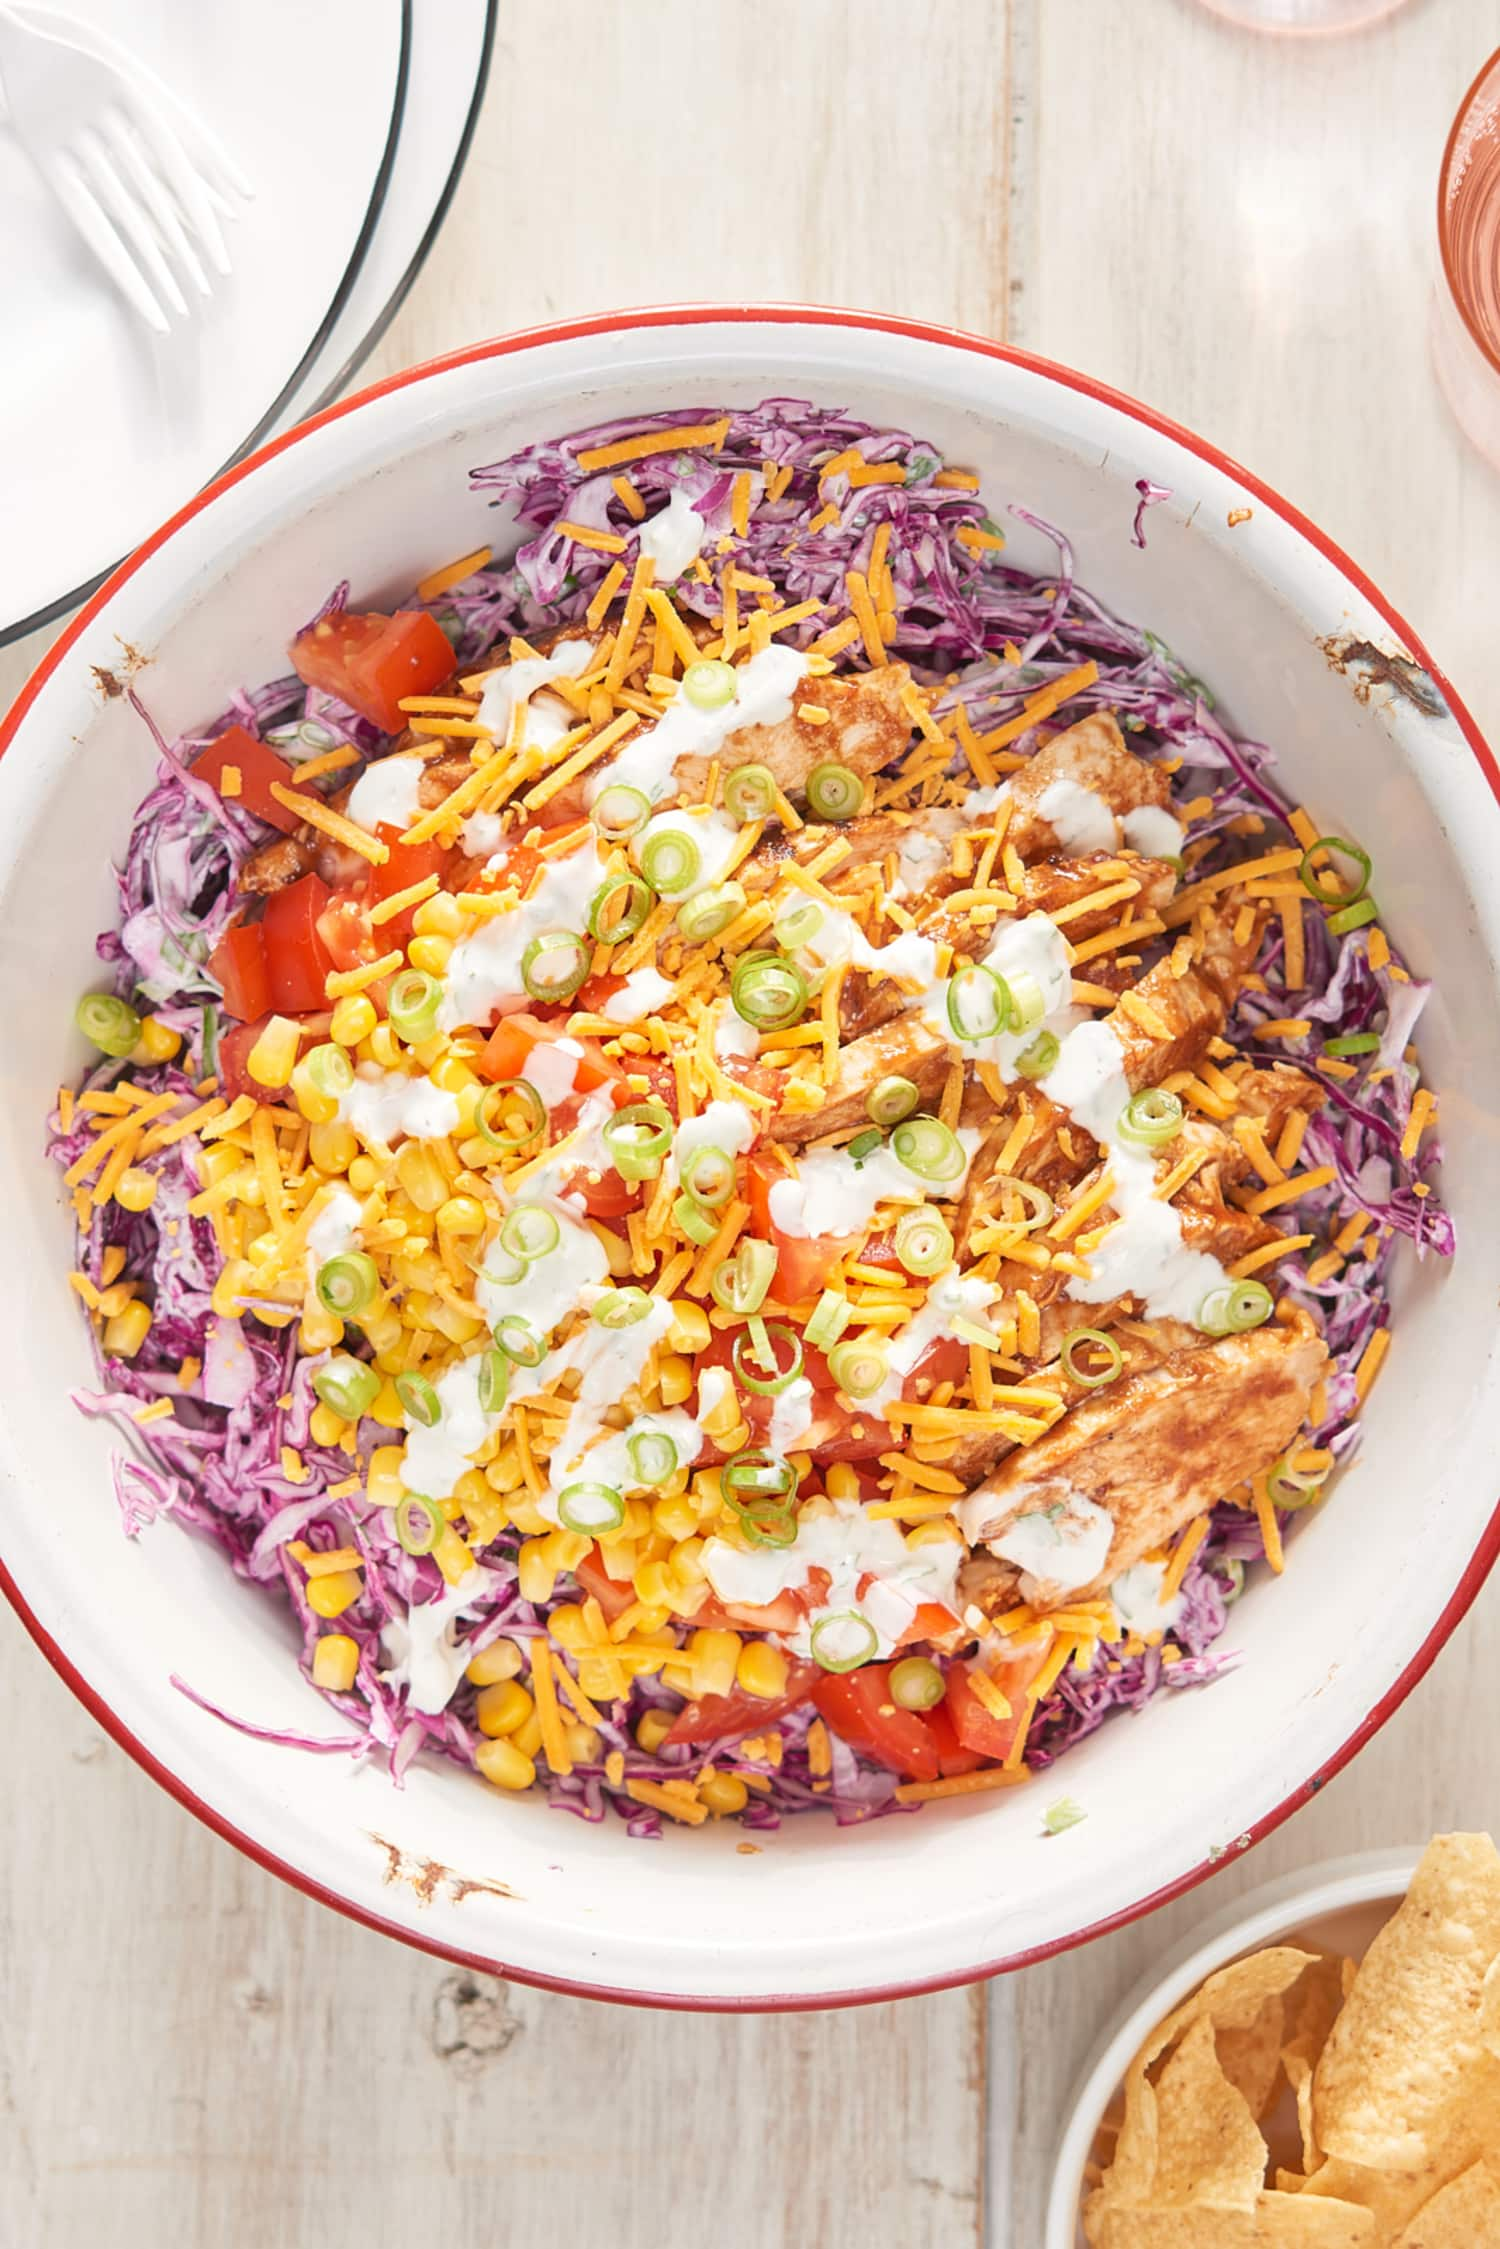 Recipe: Chopped BBQ Chicken Salad